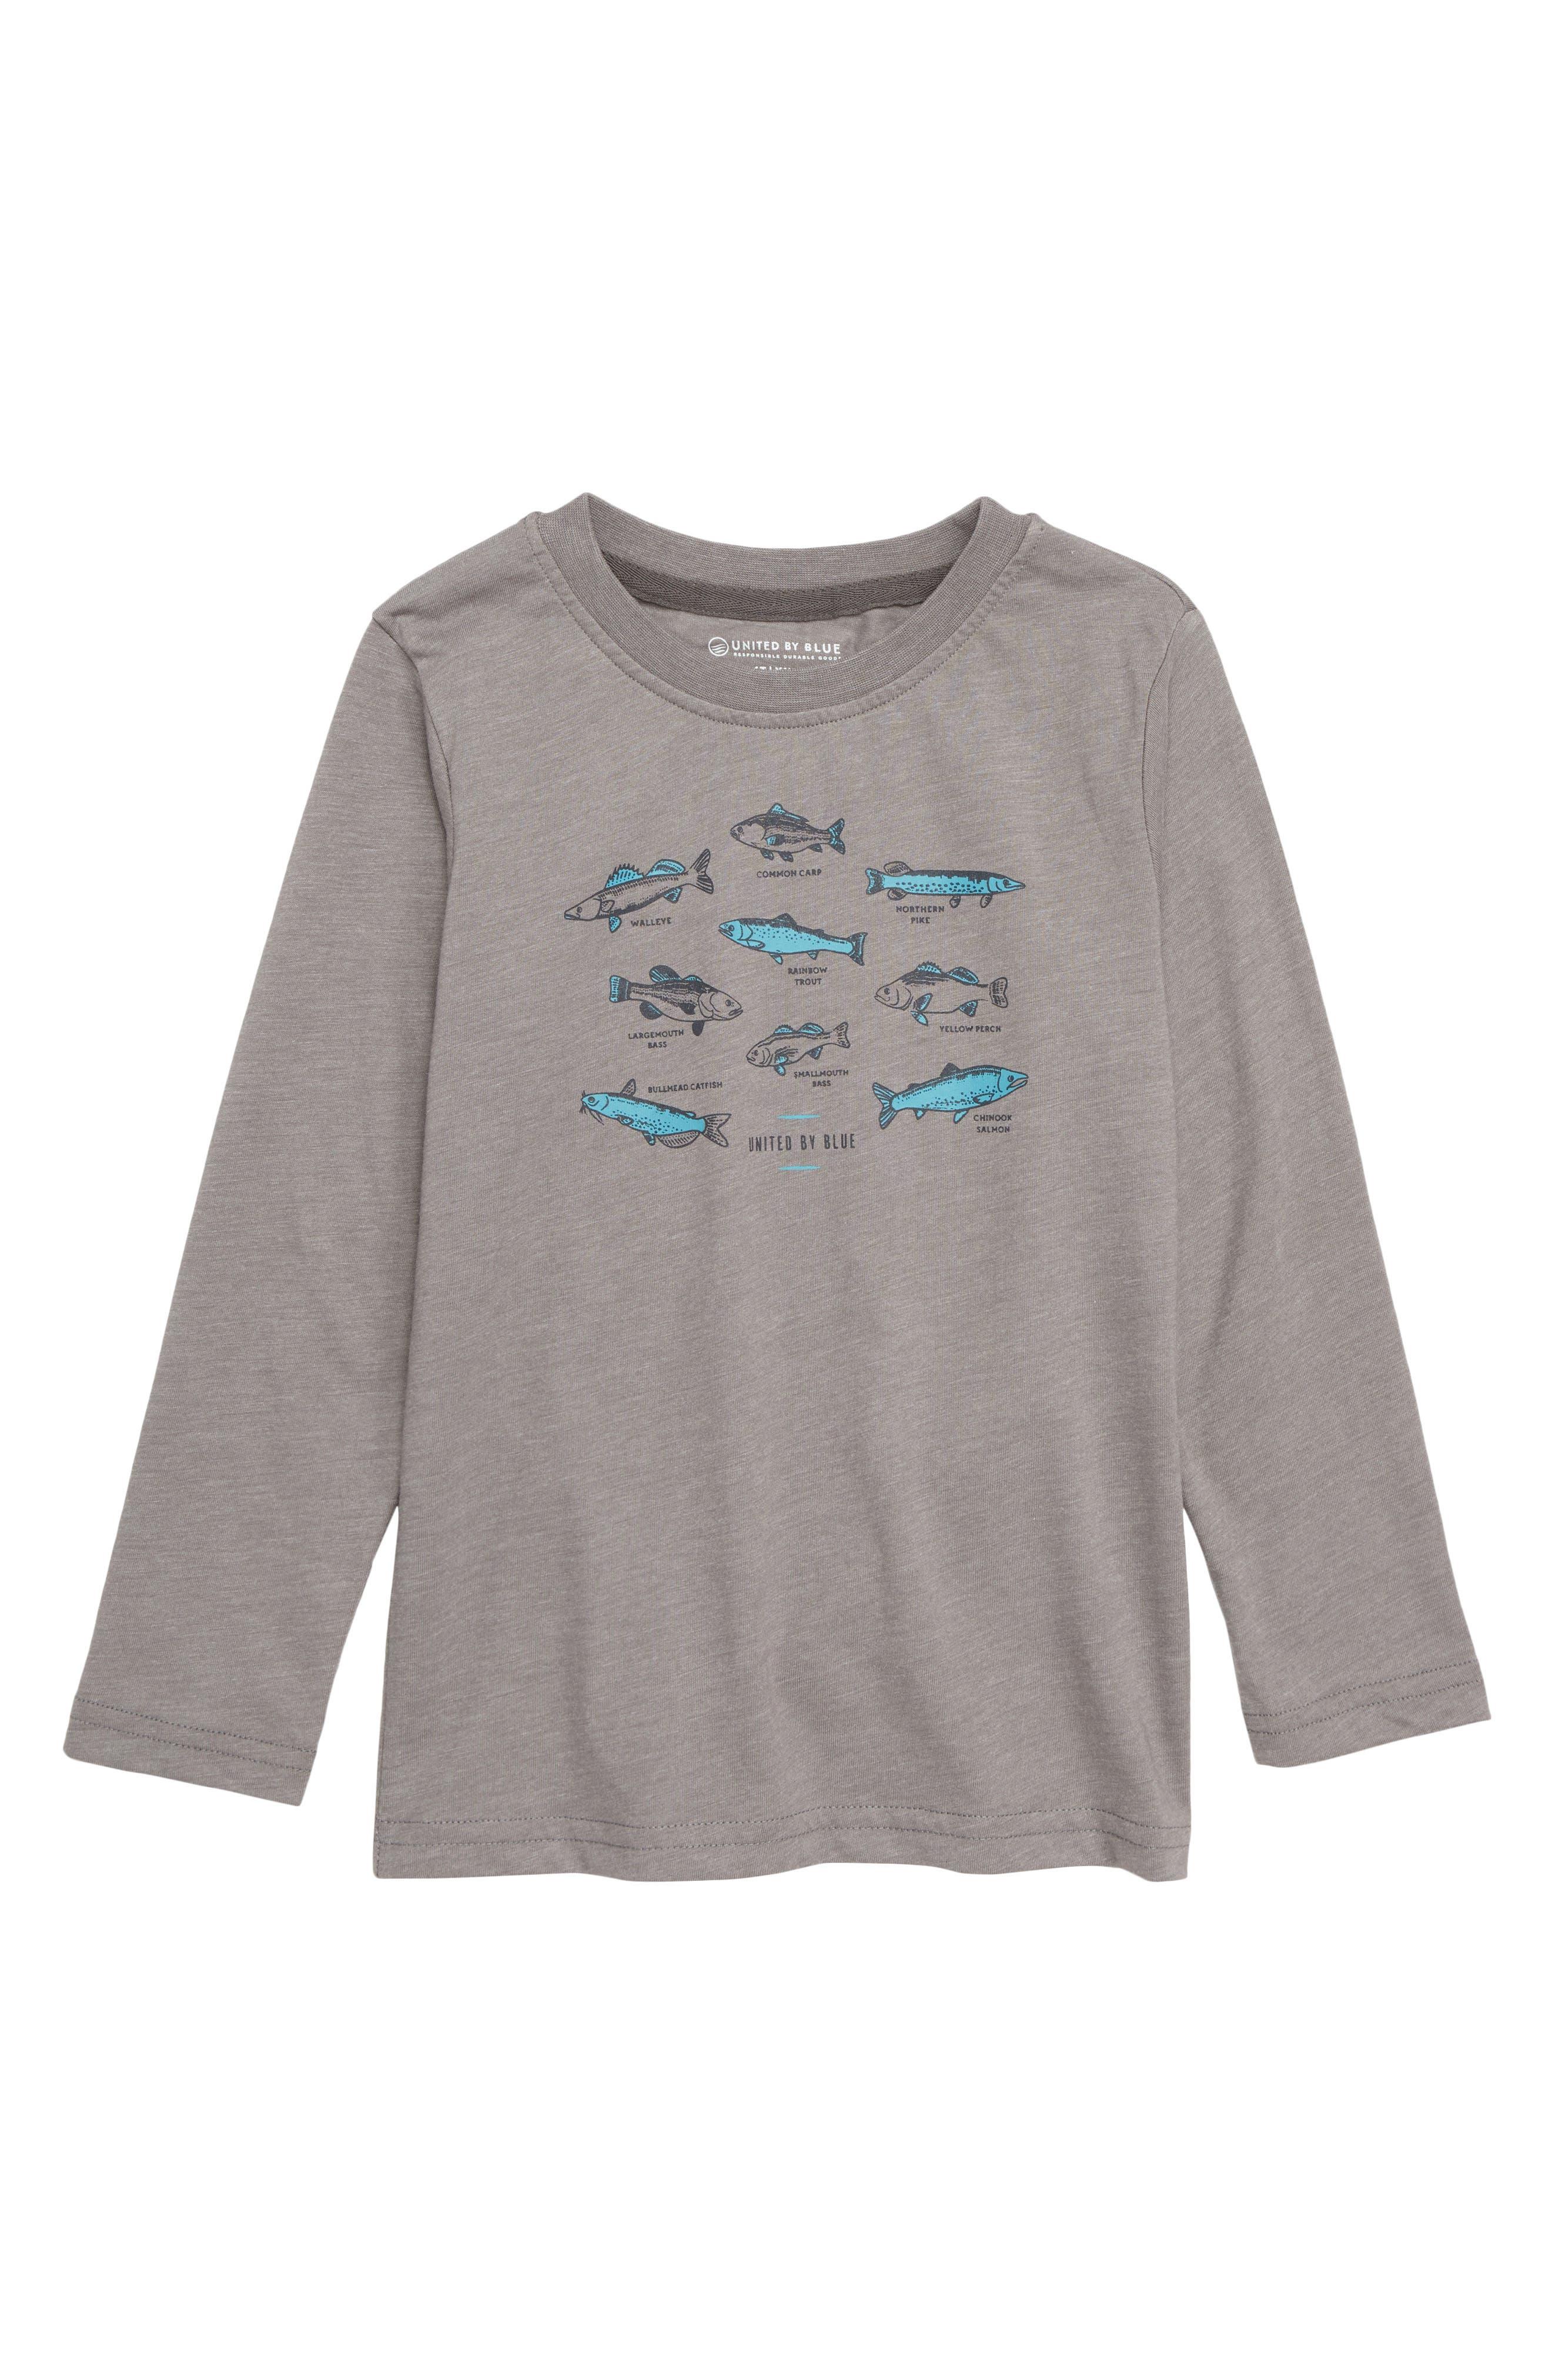 Go Fish T-Shirt,                             Main thumbnail 1, color,                             STEEL GREY